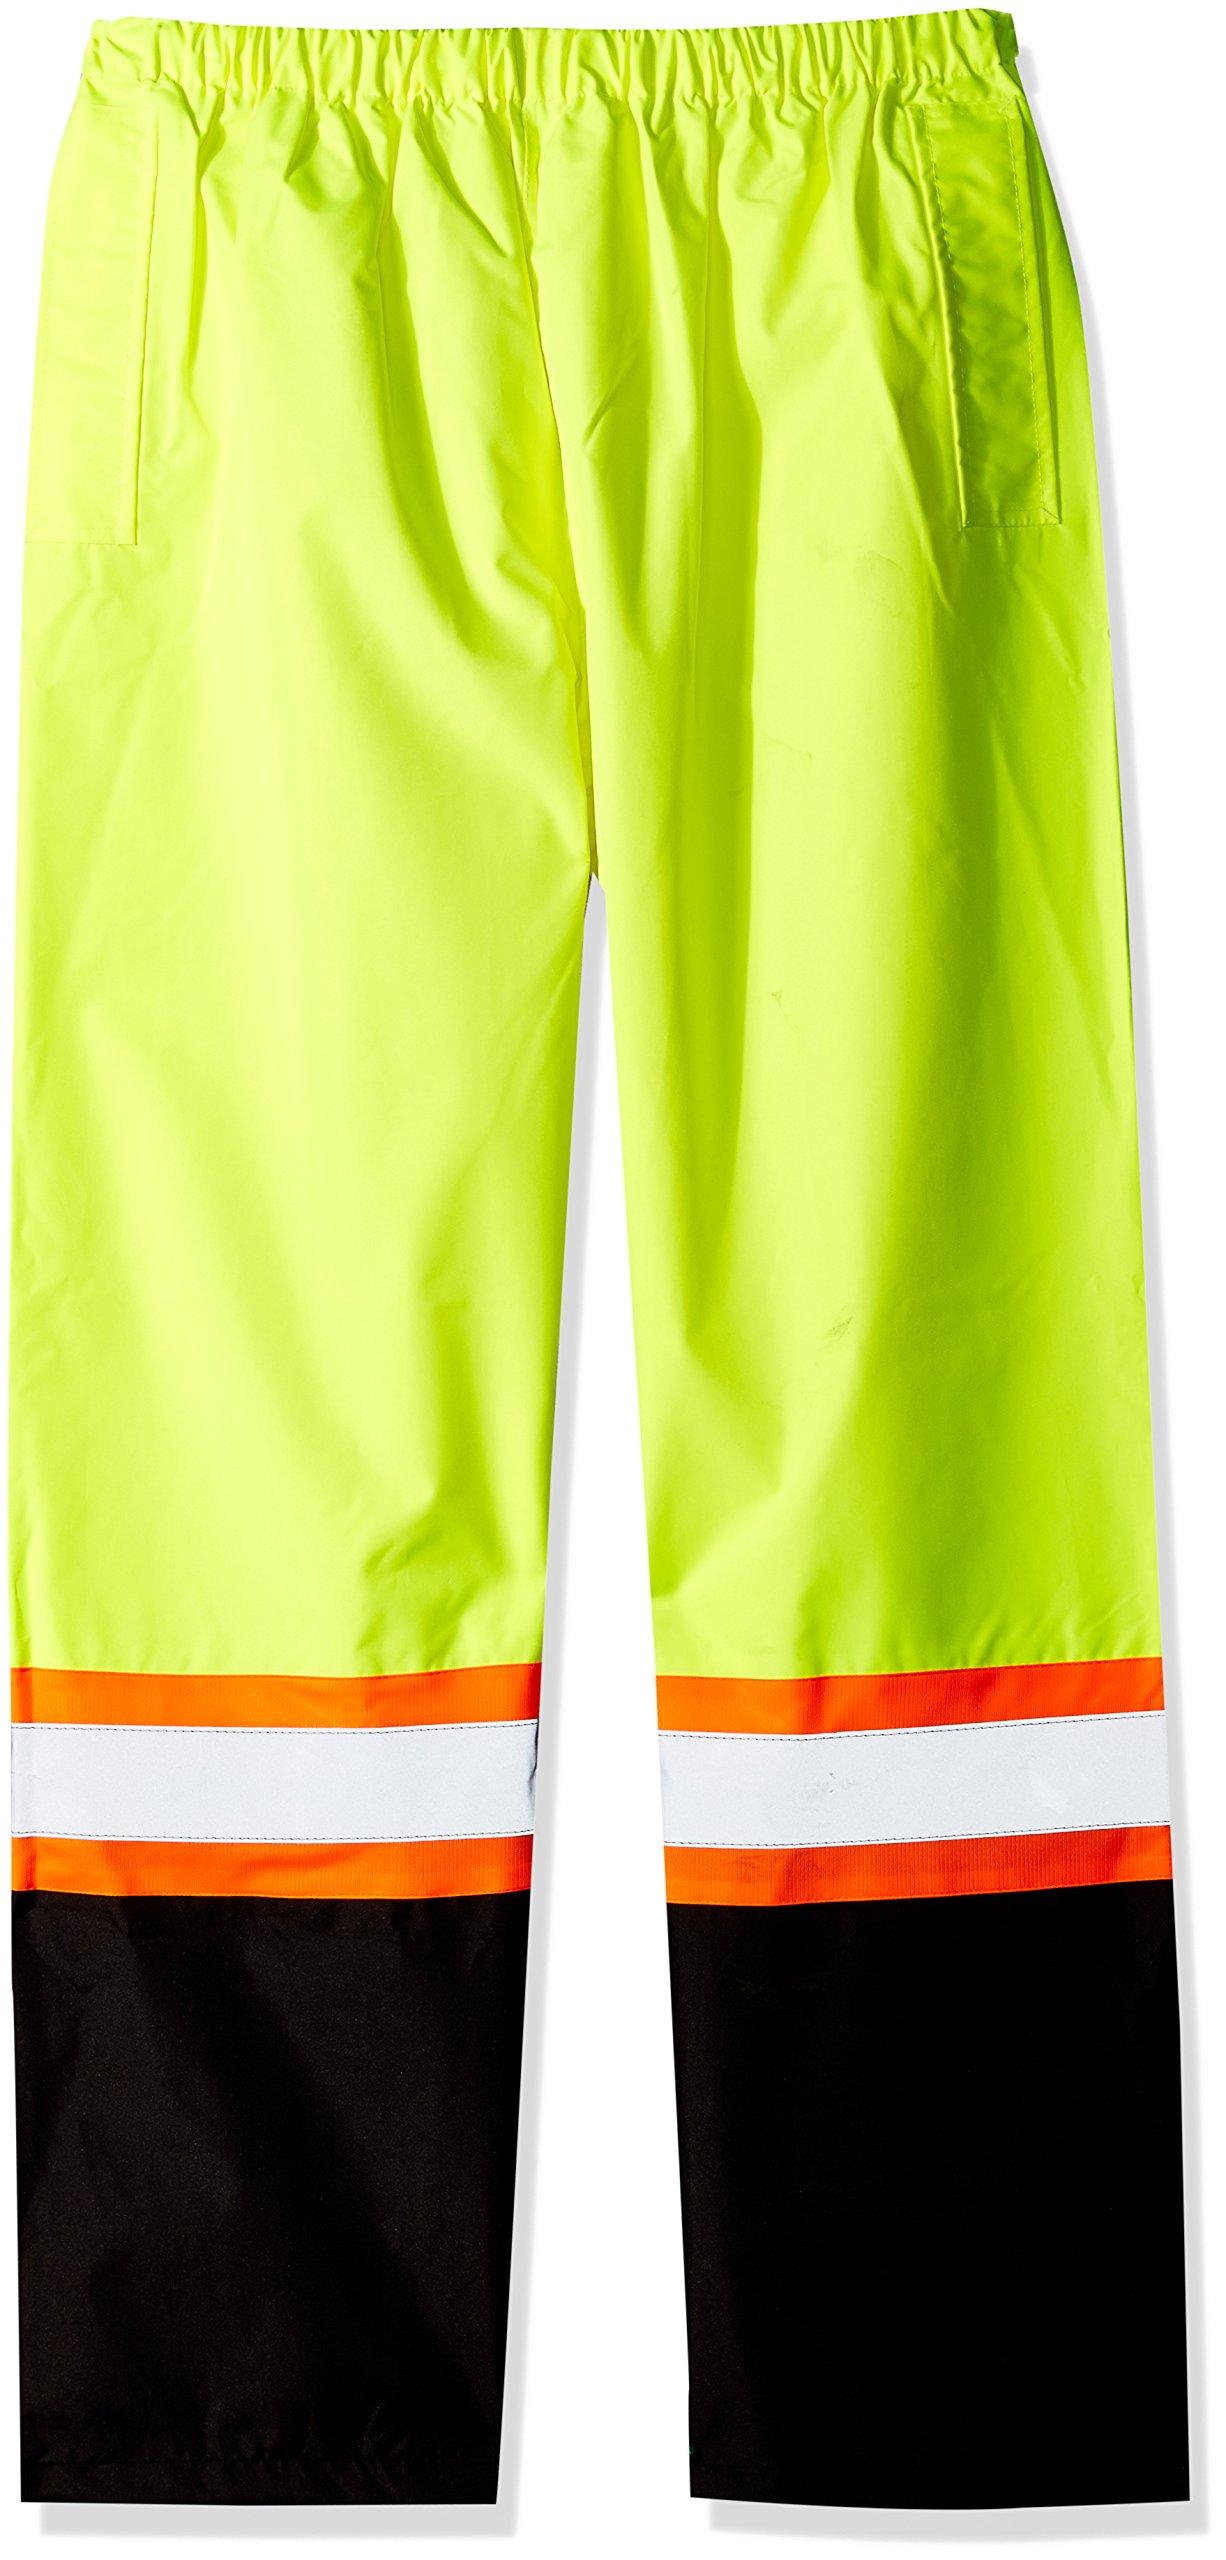 SAS Safety 690-1911 Hi-Viz Class-E Rain Pants with Contrast Trim, XX-Large, Yellow